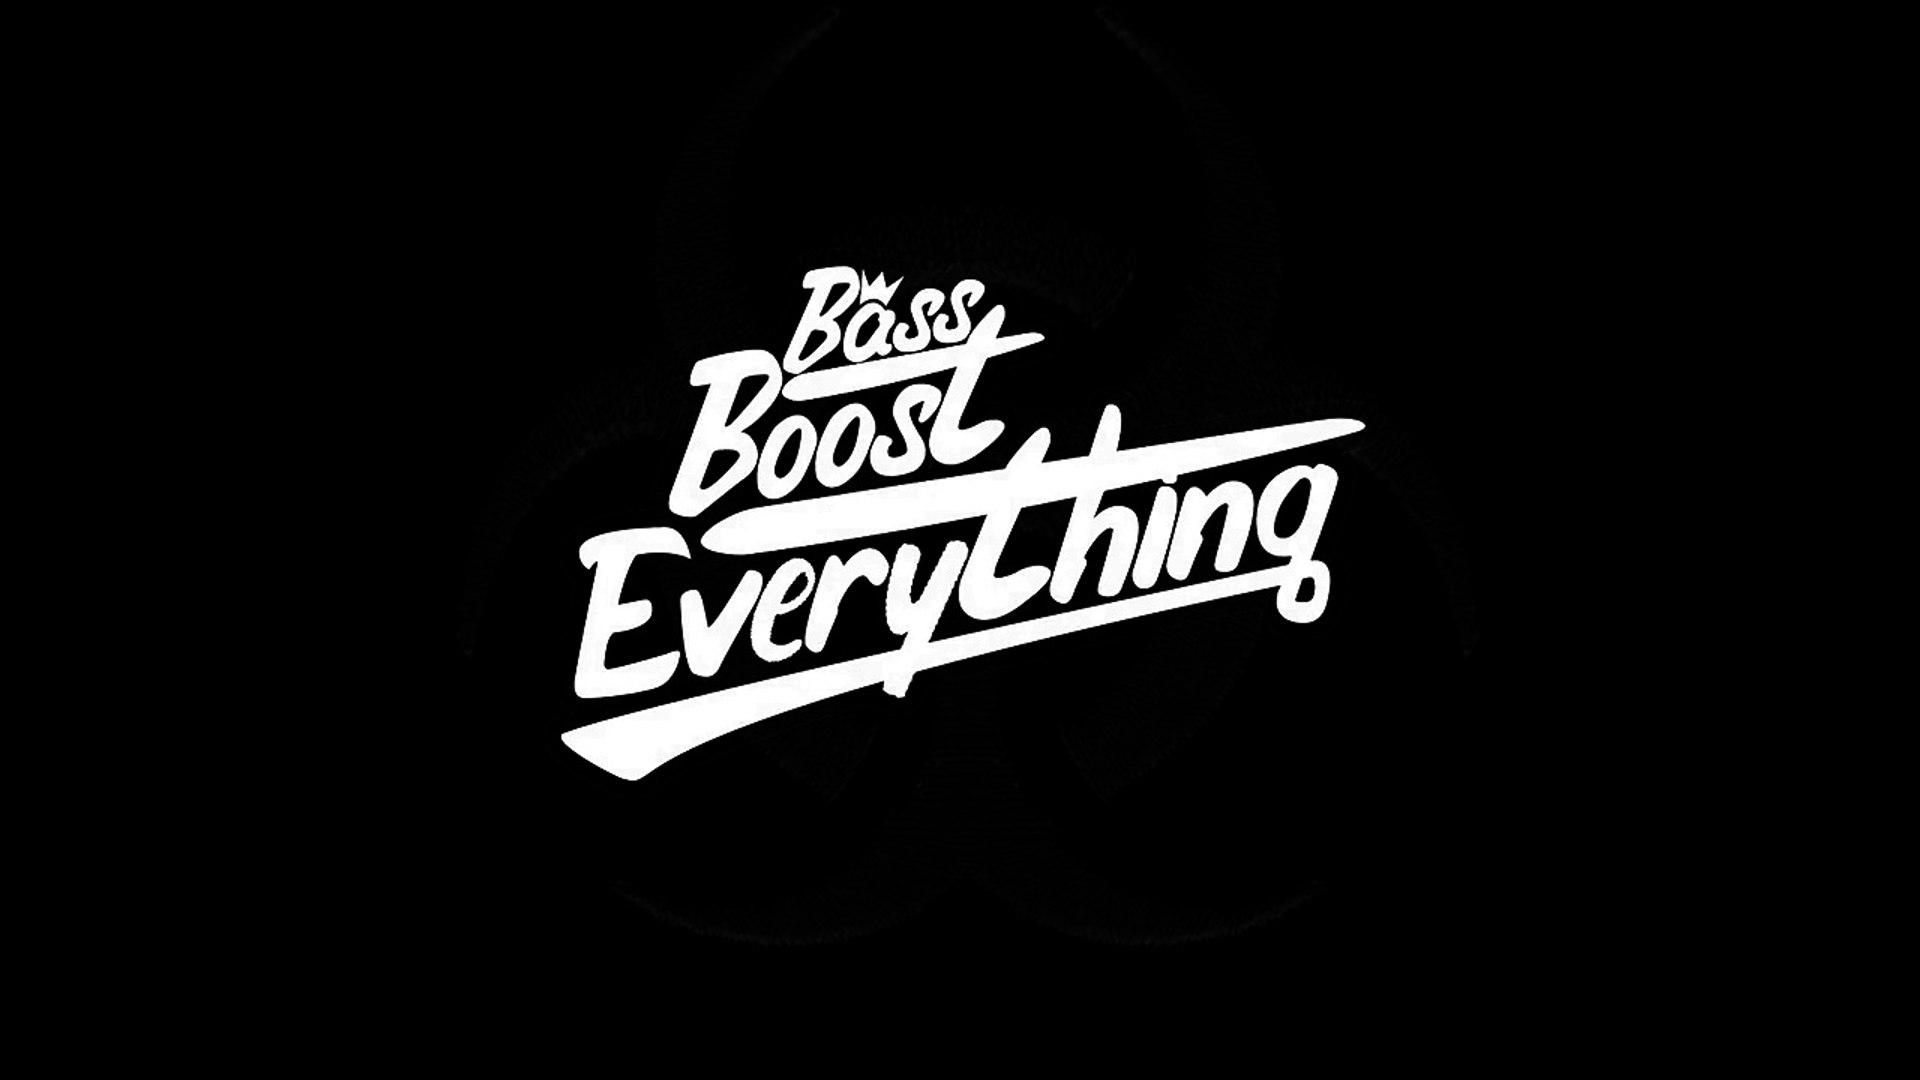 ⚠️EXTREME BASS DROP TEST!!! (EXTREME BASS TEST)⚠️